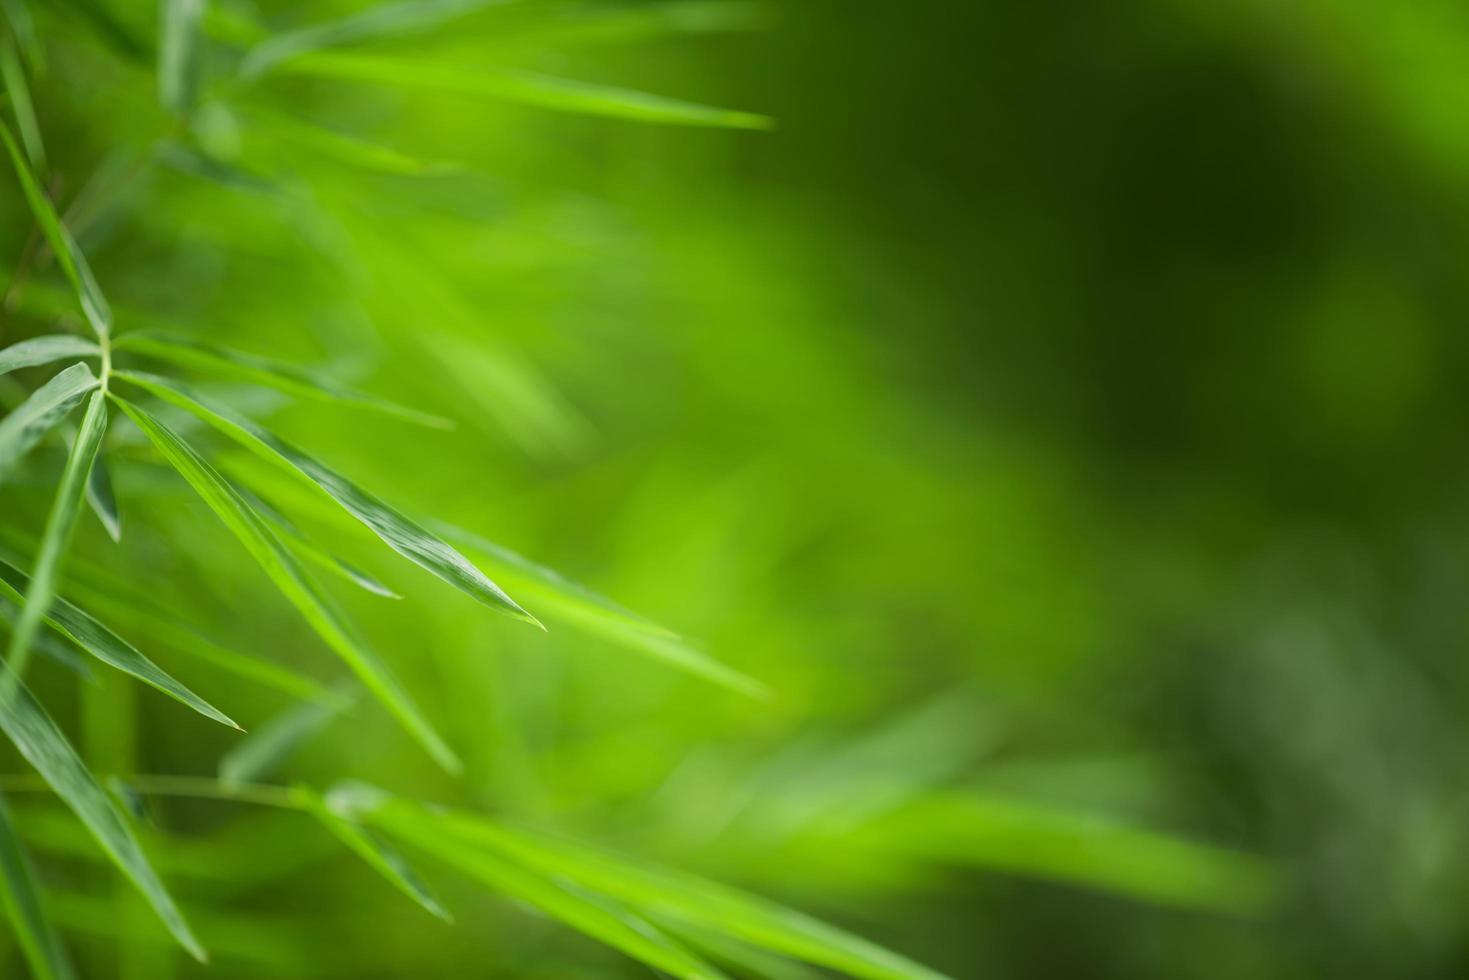 sfondo di bambù verde foto